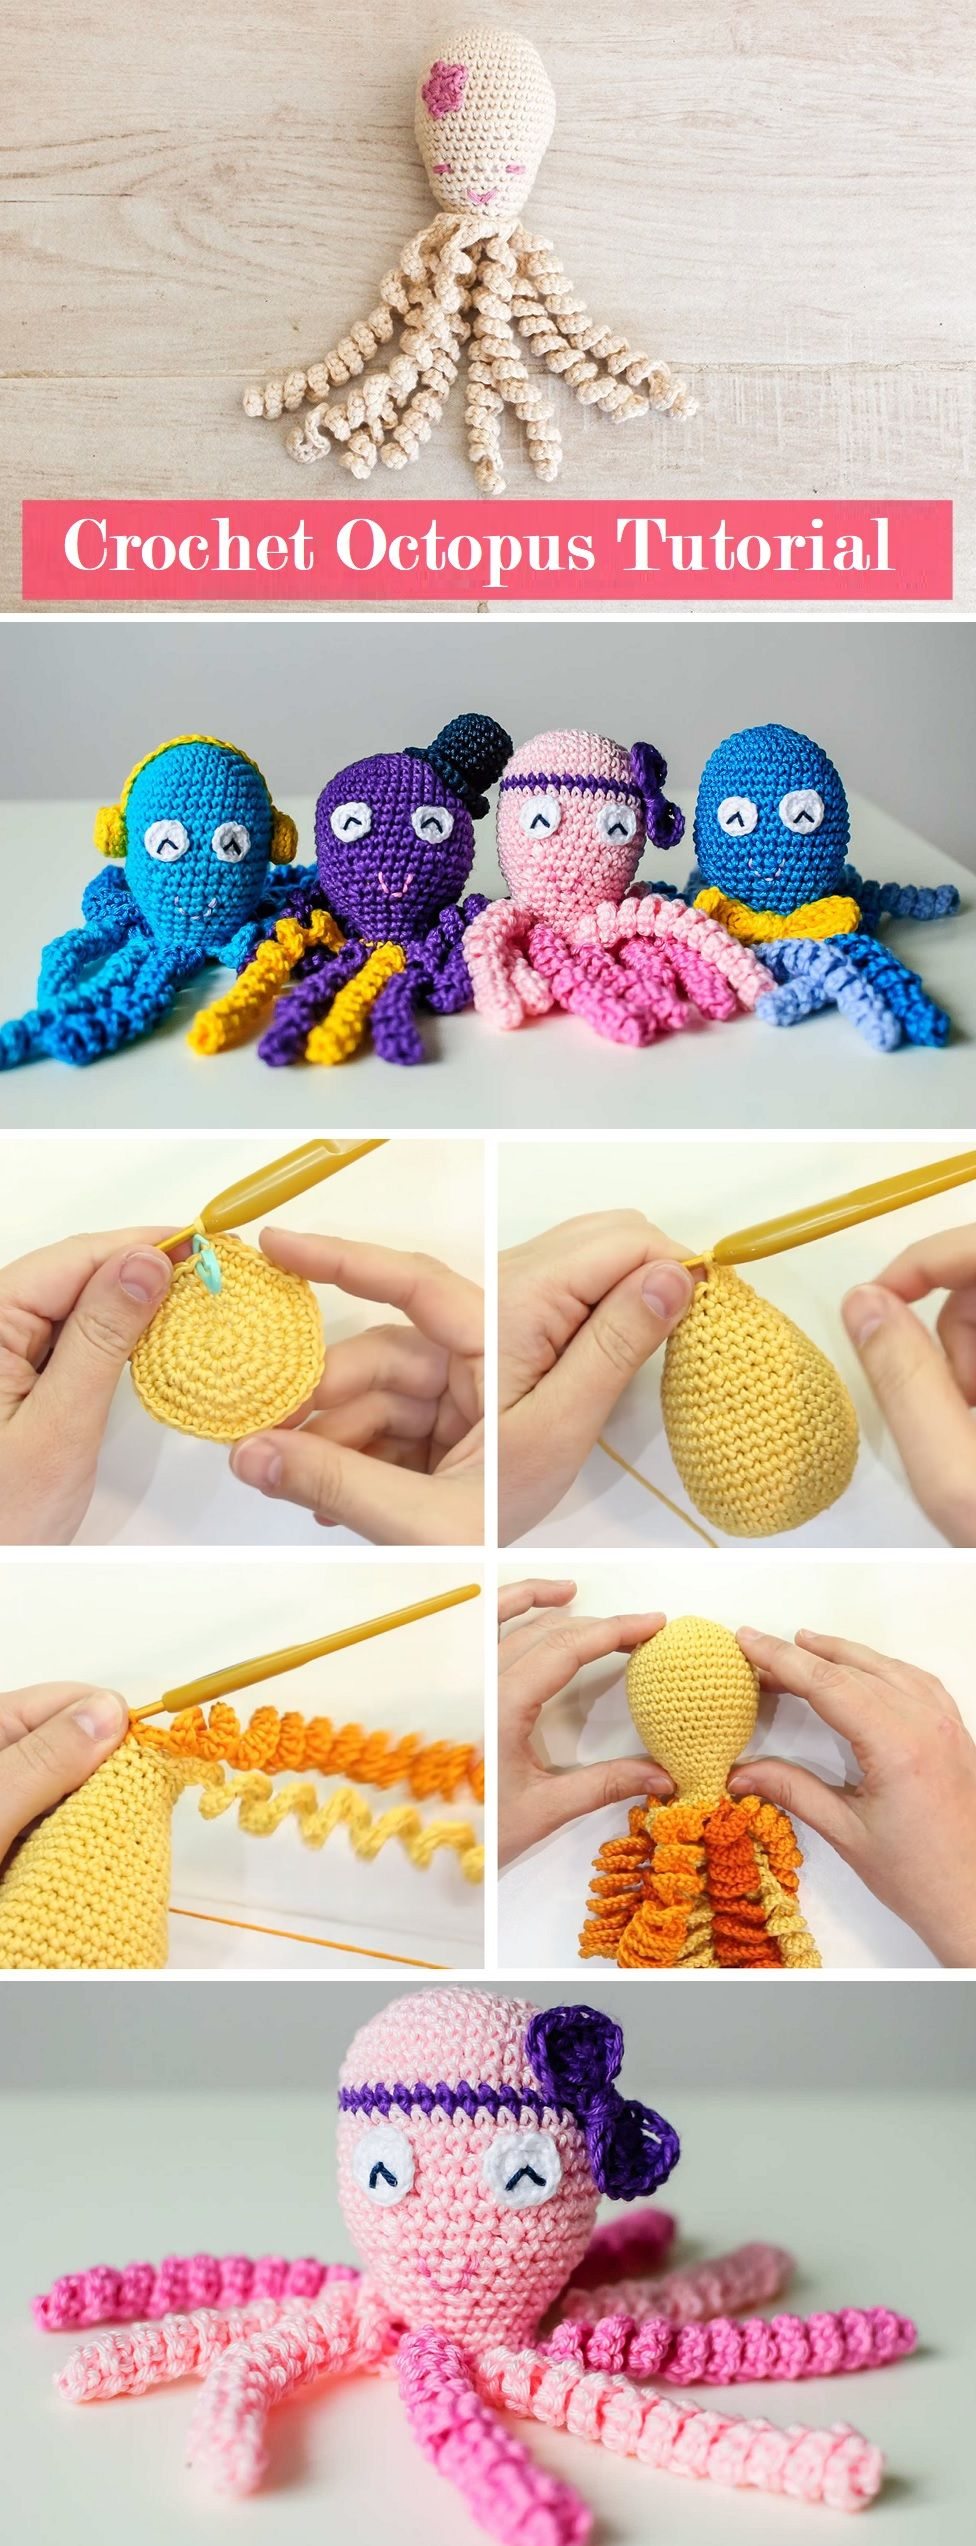 Octopus Crochet Tutorial - Design Peak